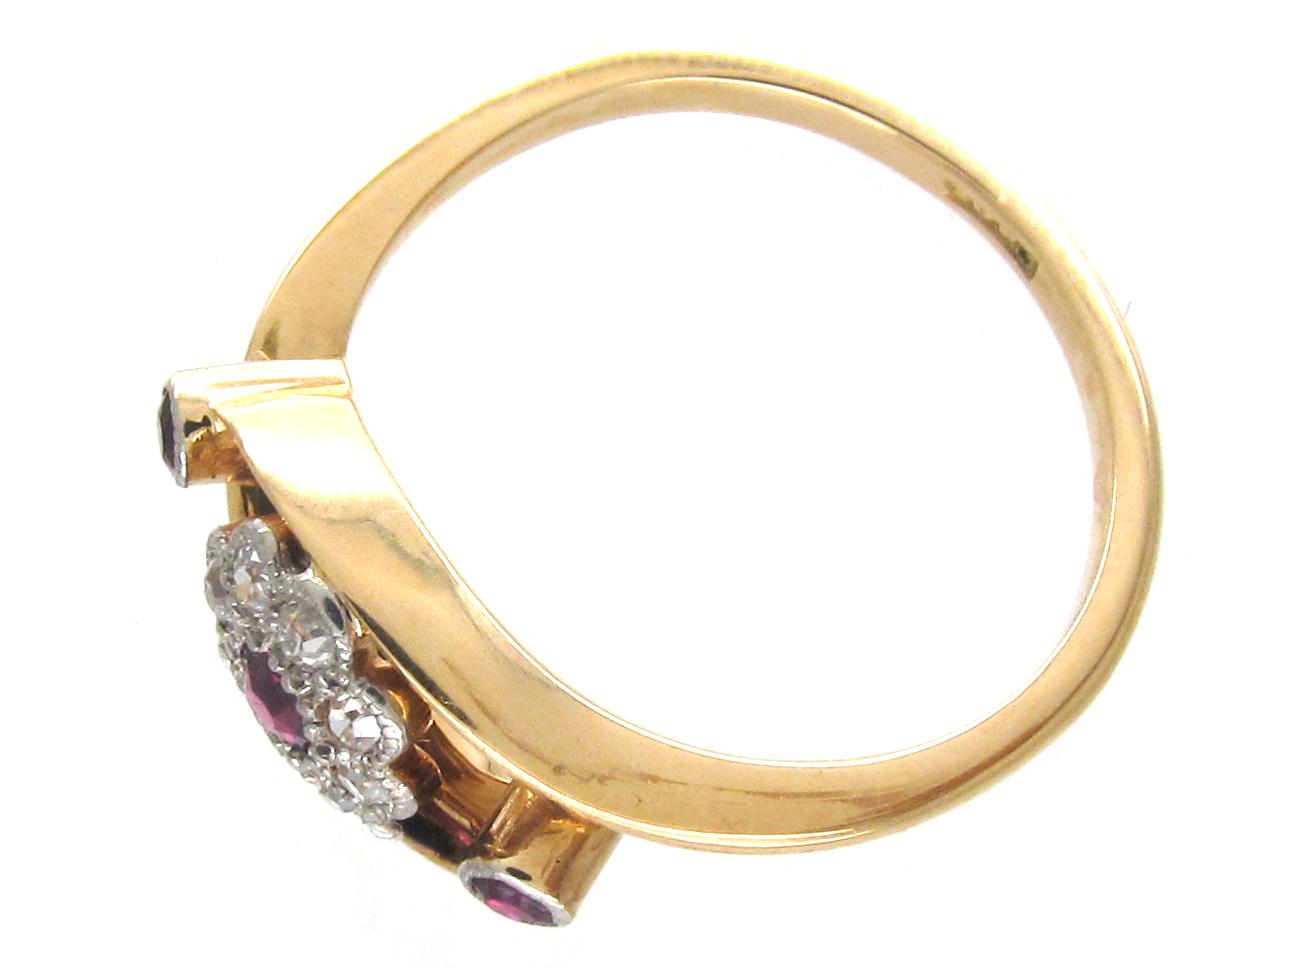 Edwardian Ruby & Diamond Open Cluster Ring